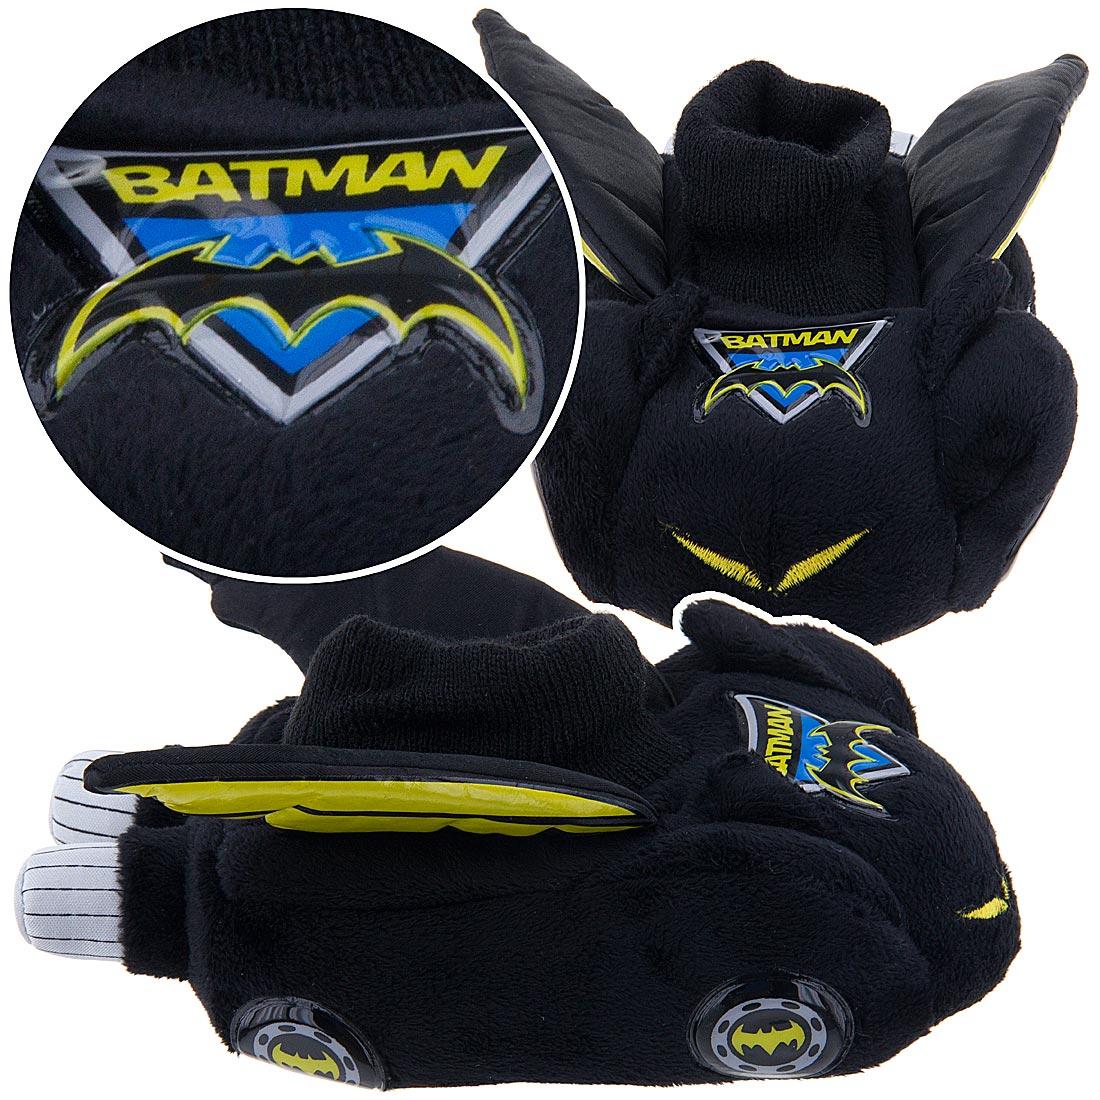 gadget-pantofole-batman